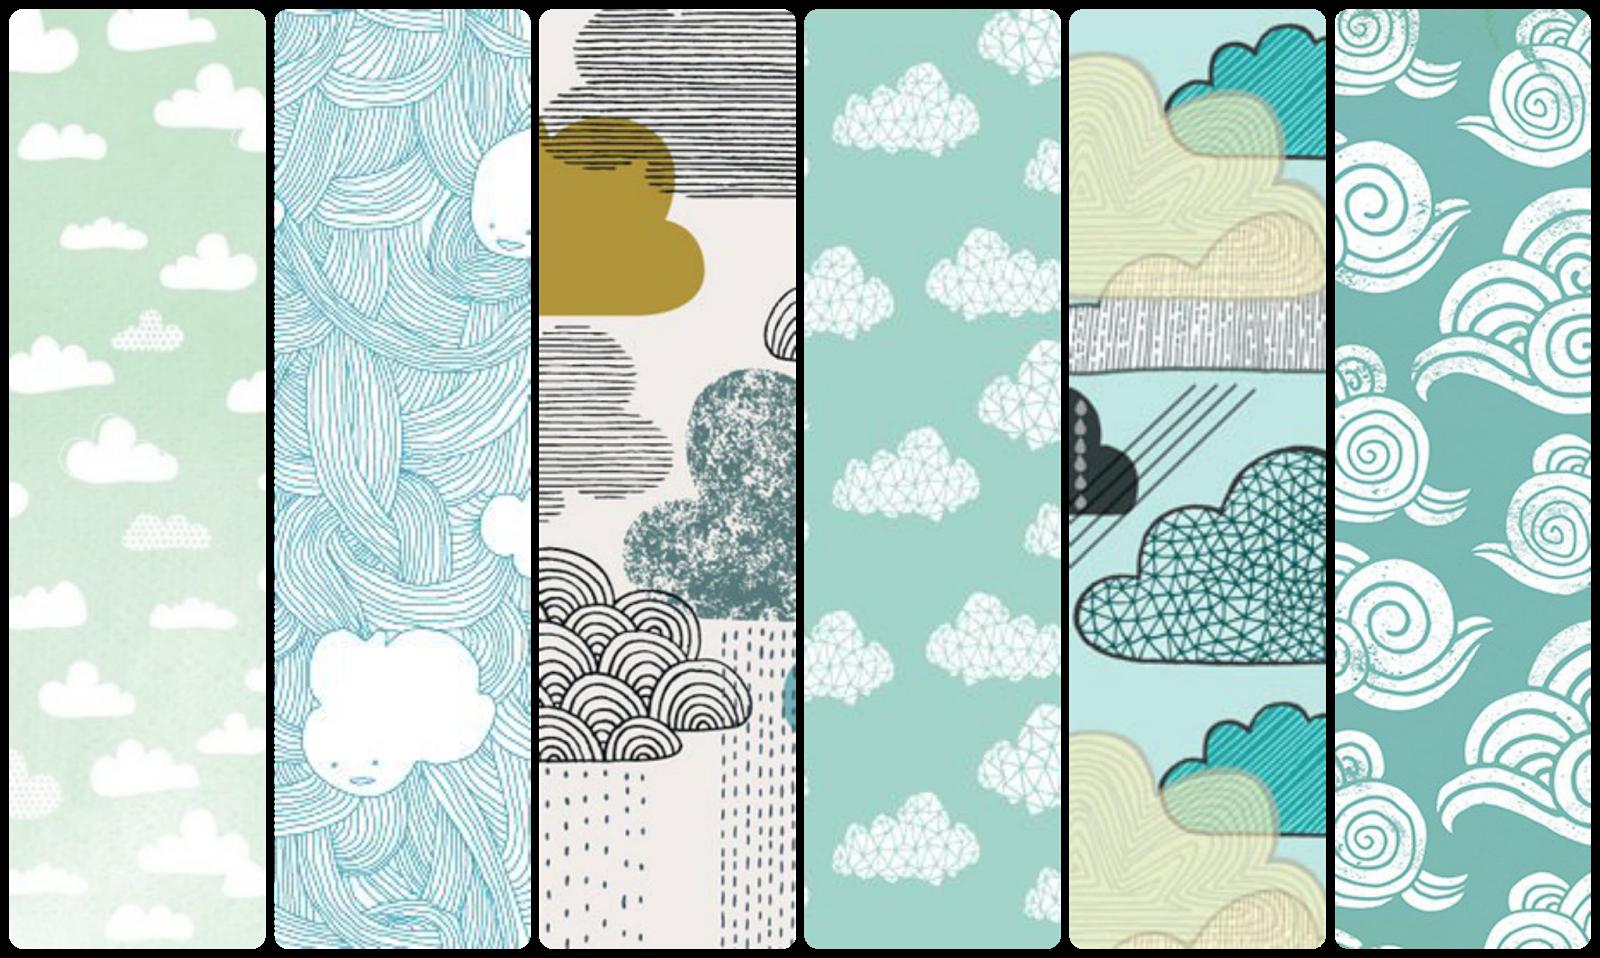 fondos de pantalla nubes whatsapp pattern iphone wallpaper android